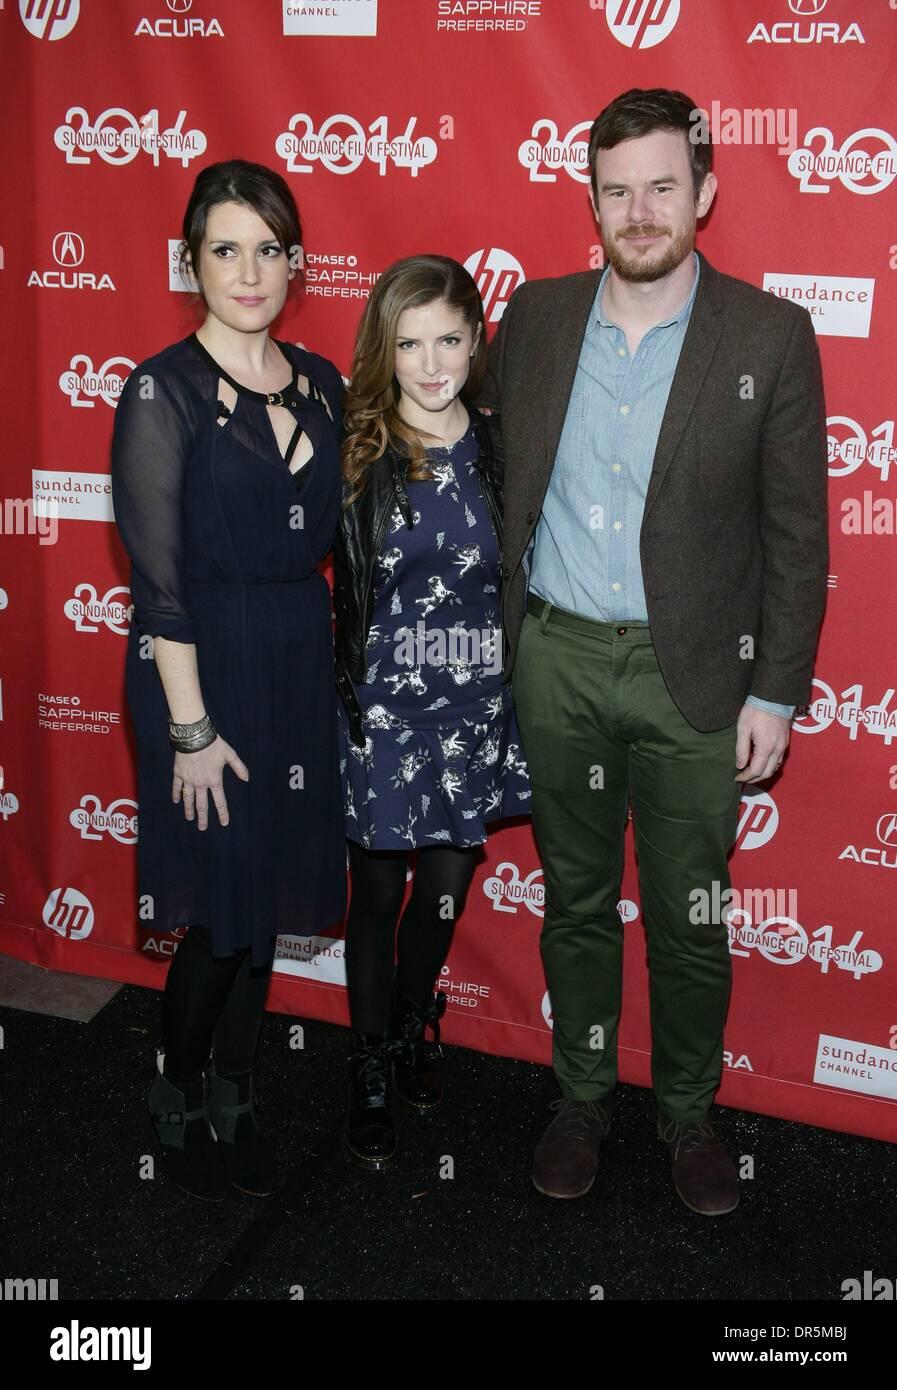 Anna Kendrick And Joe Swanberg Stockfotos & Anna Kendrick And Joe ...